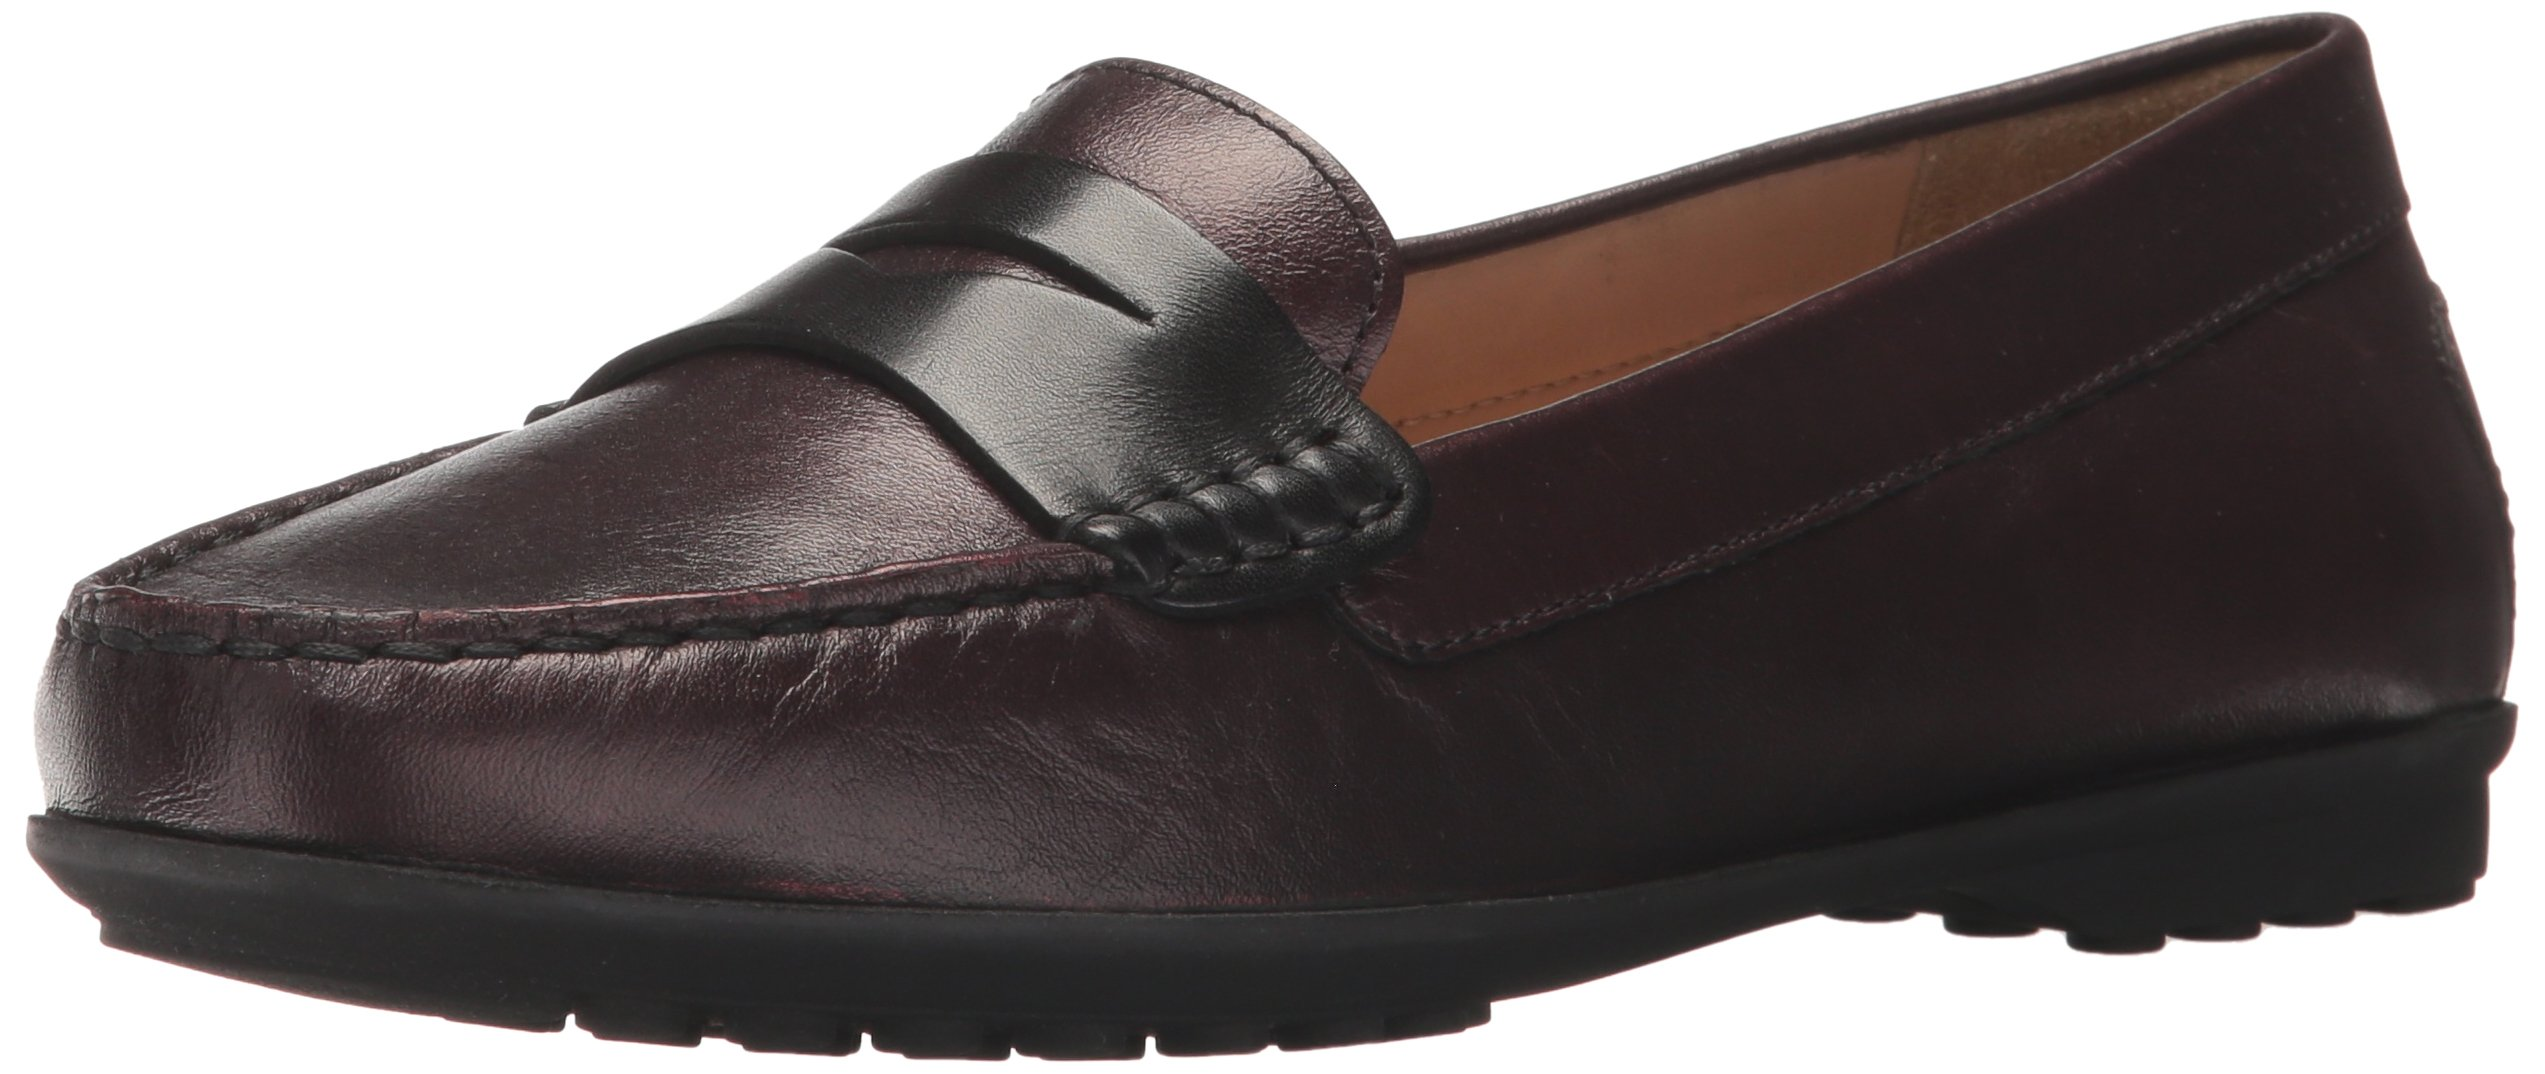 Geox Women's Elidia 5 Slip-On Loafer, Dark Burgundy/Black, 36.5 EU/6.5 M US